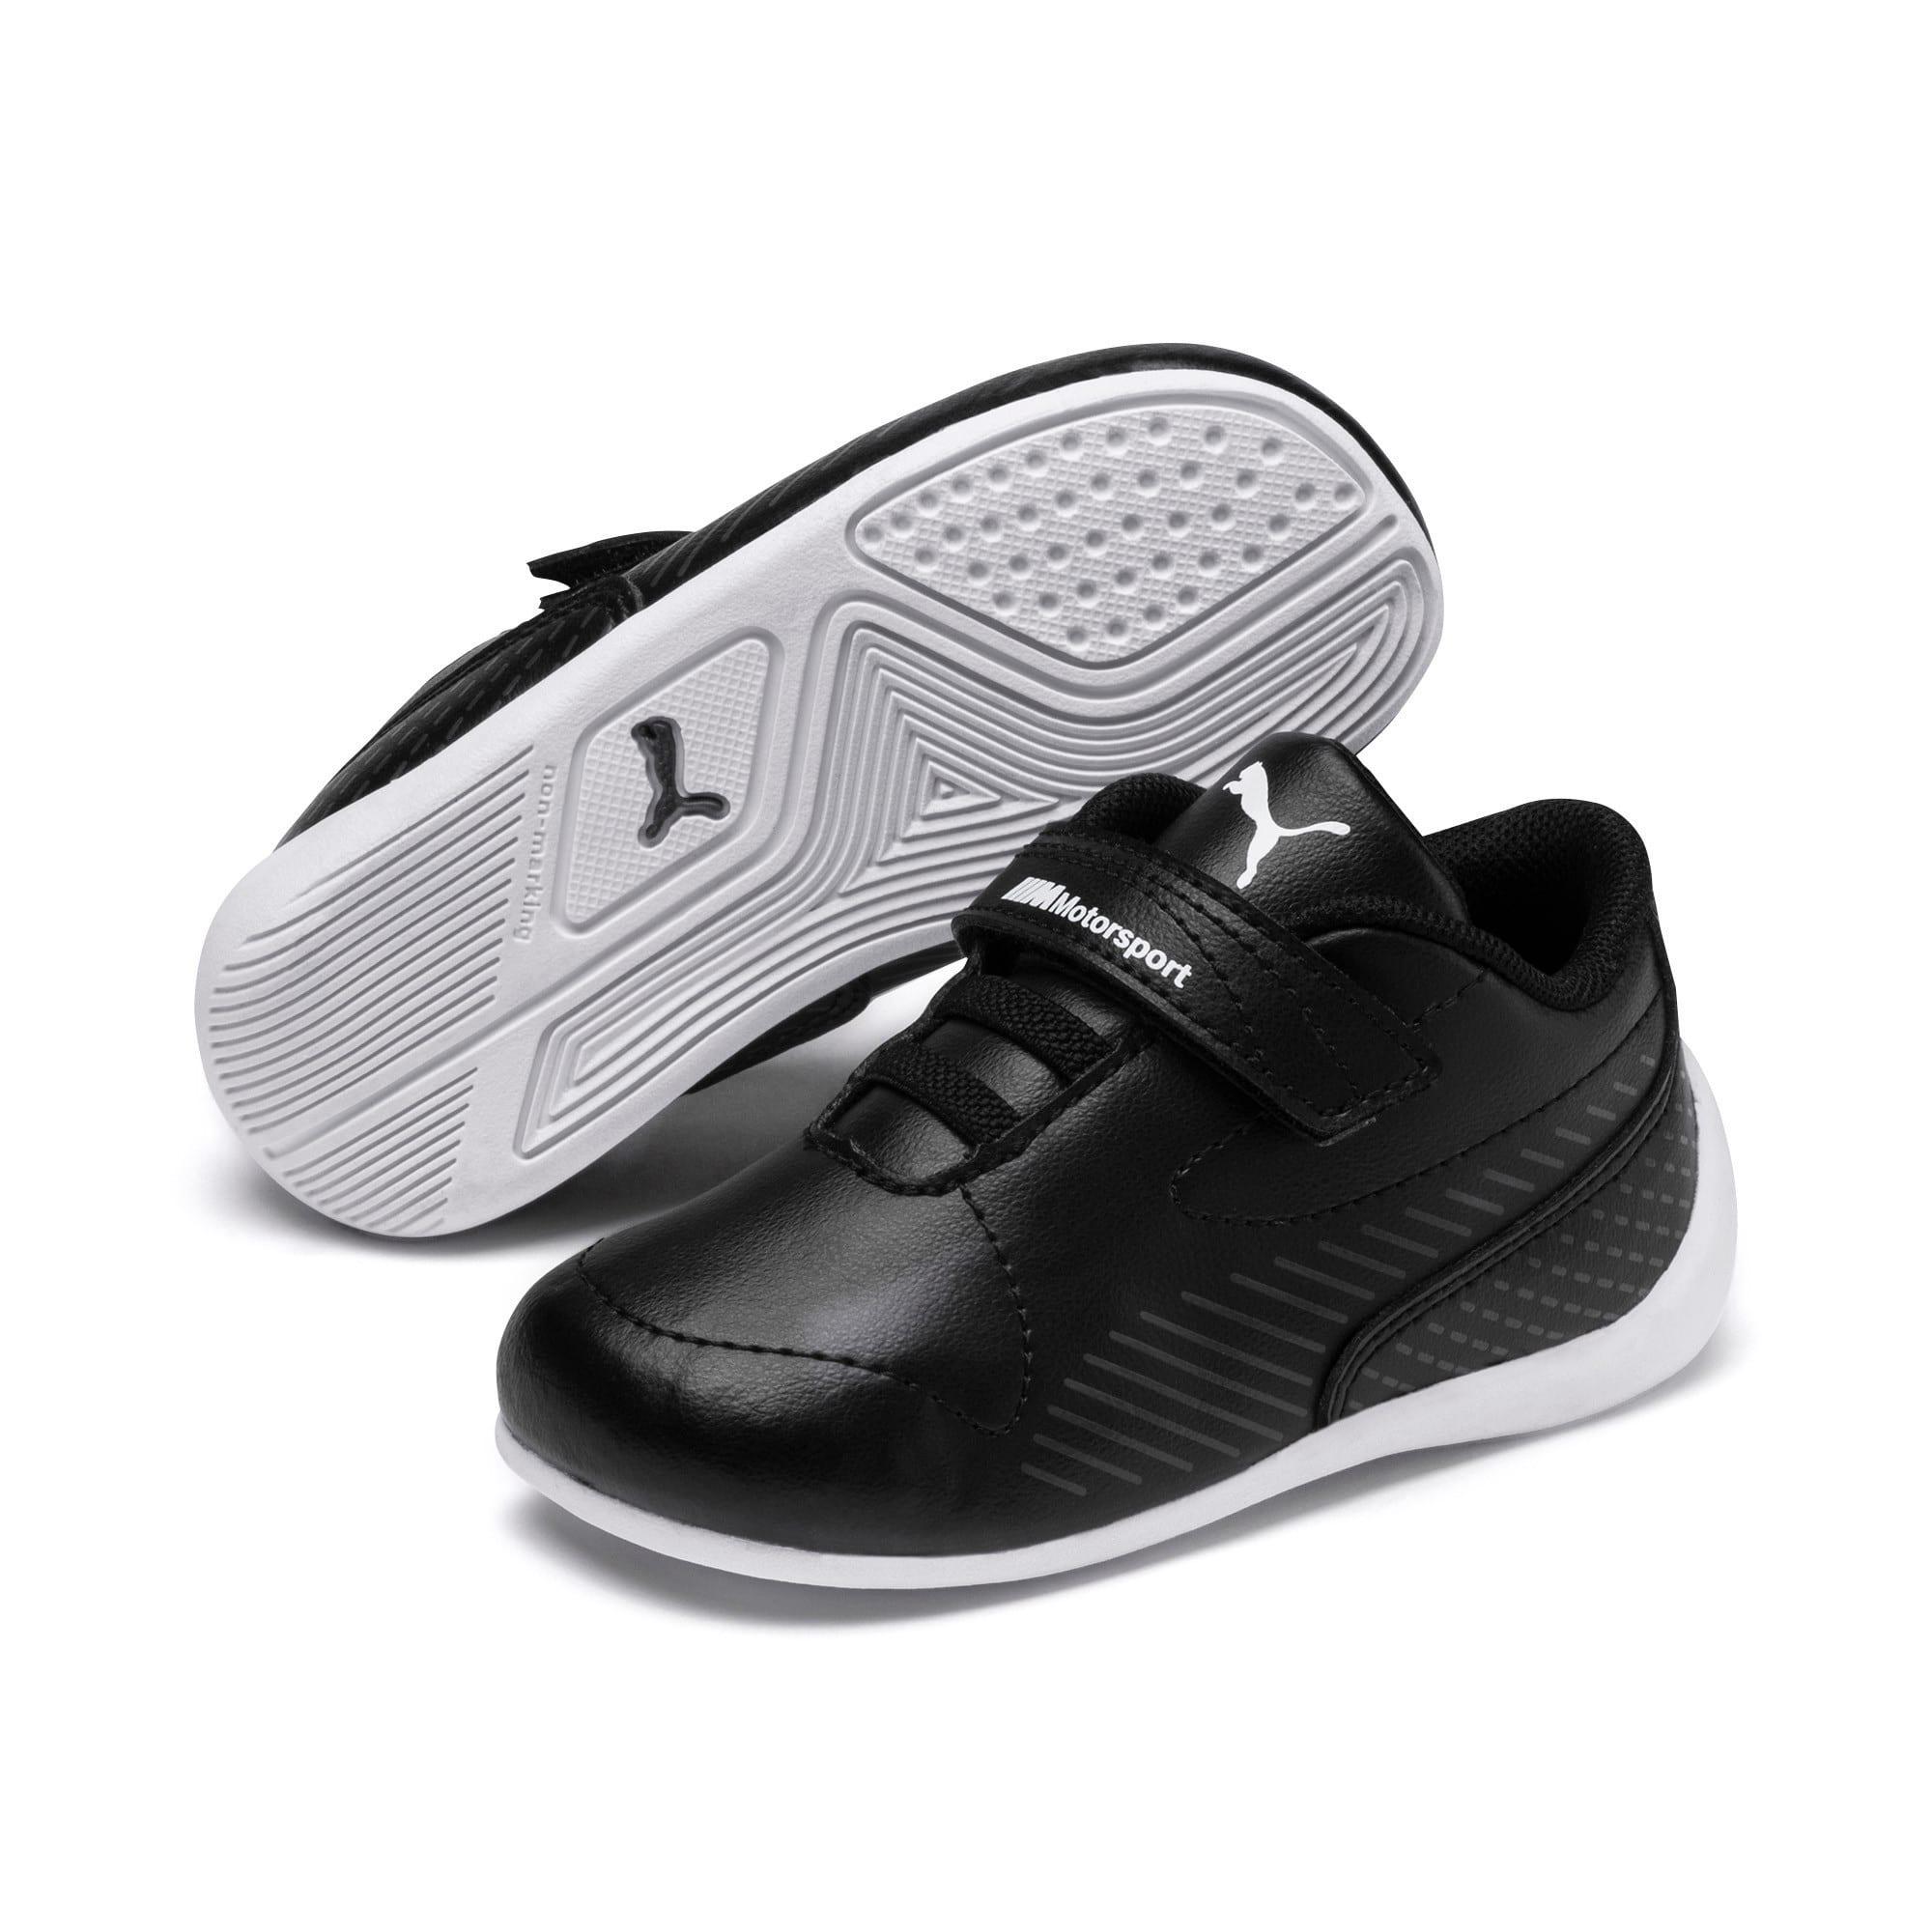 Thumbnail 1 of BMW MMS Drift Cat 7S Toddler Shoes, Puma Black-Puma Black, medium